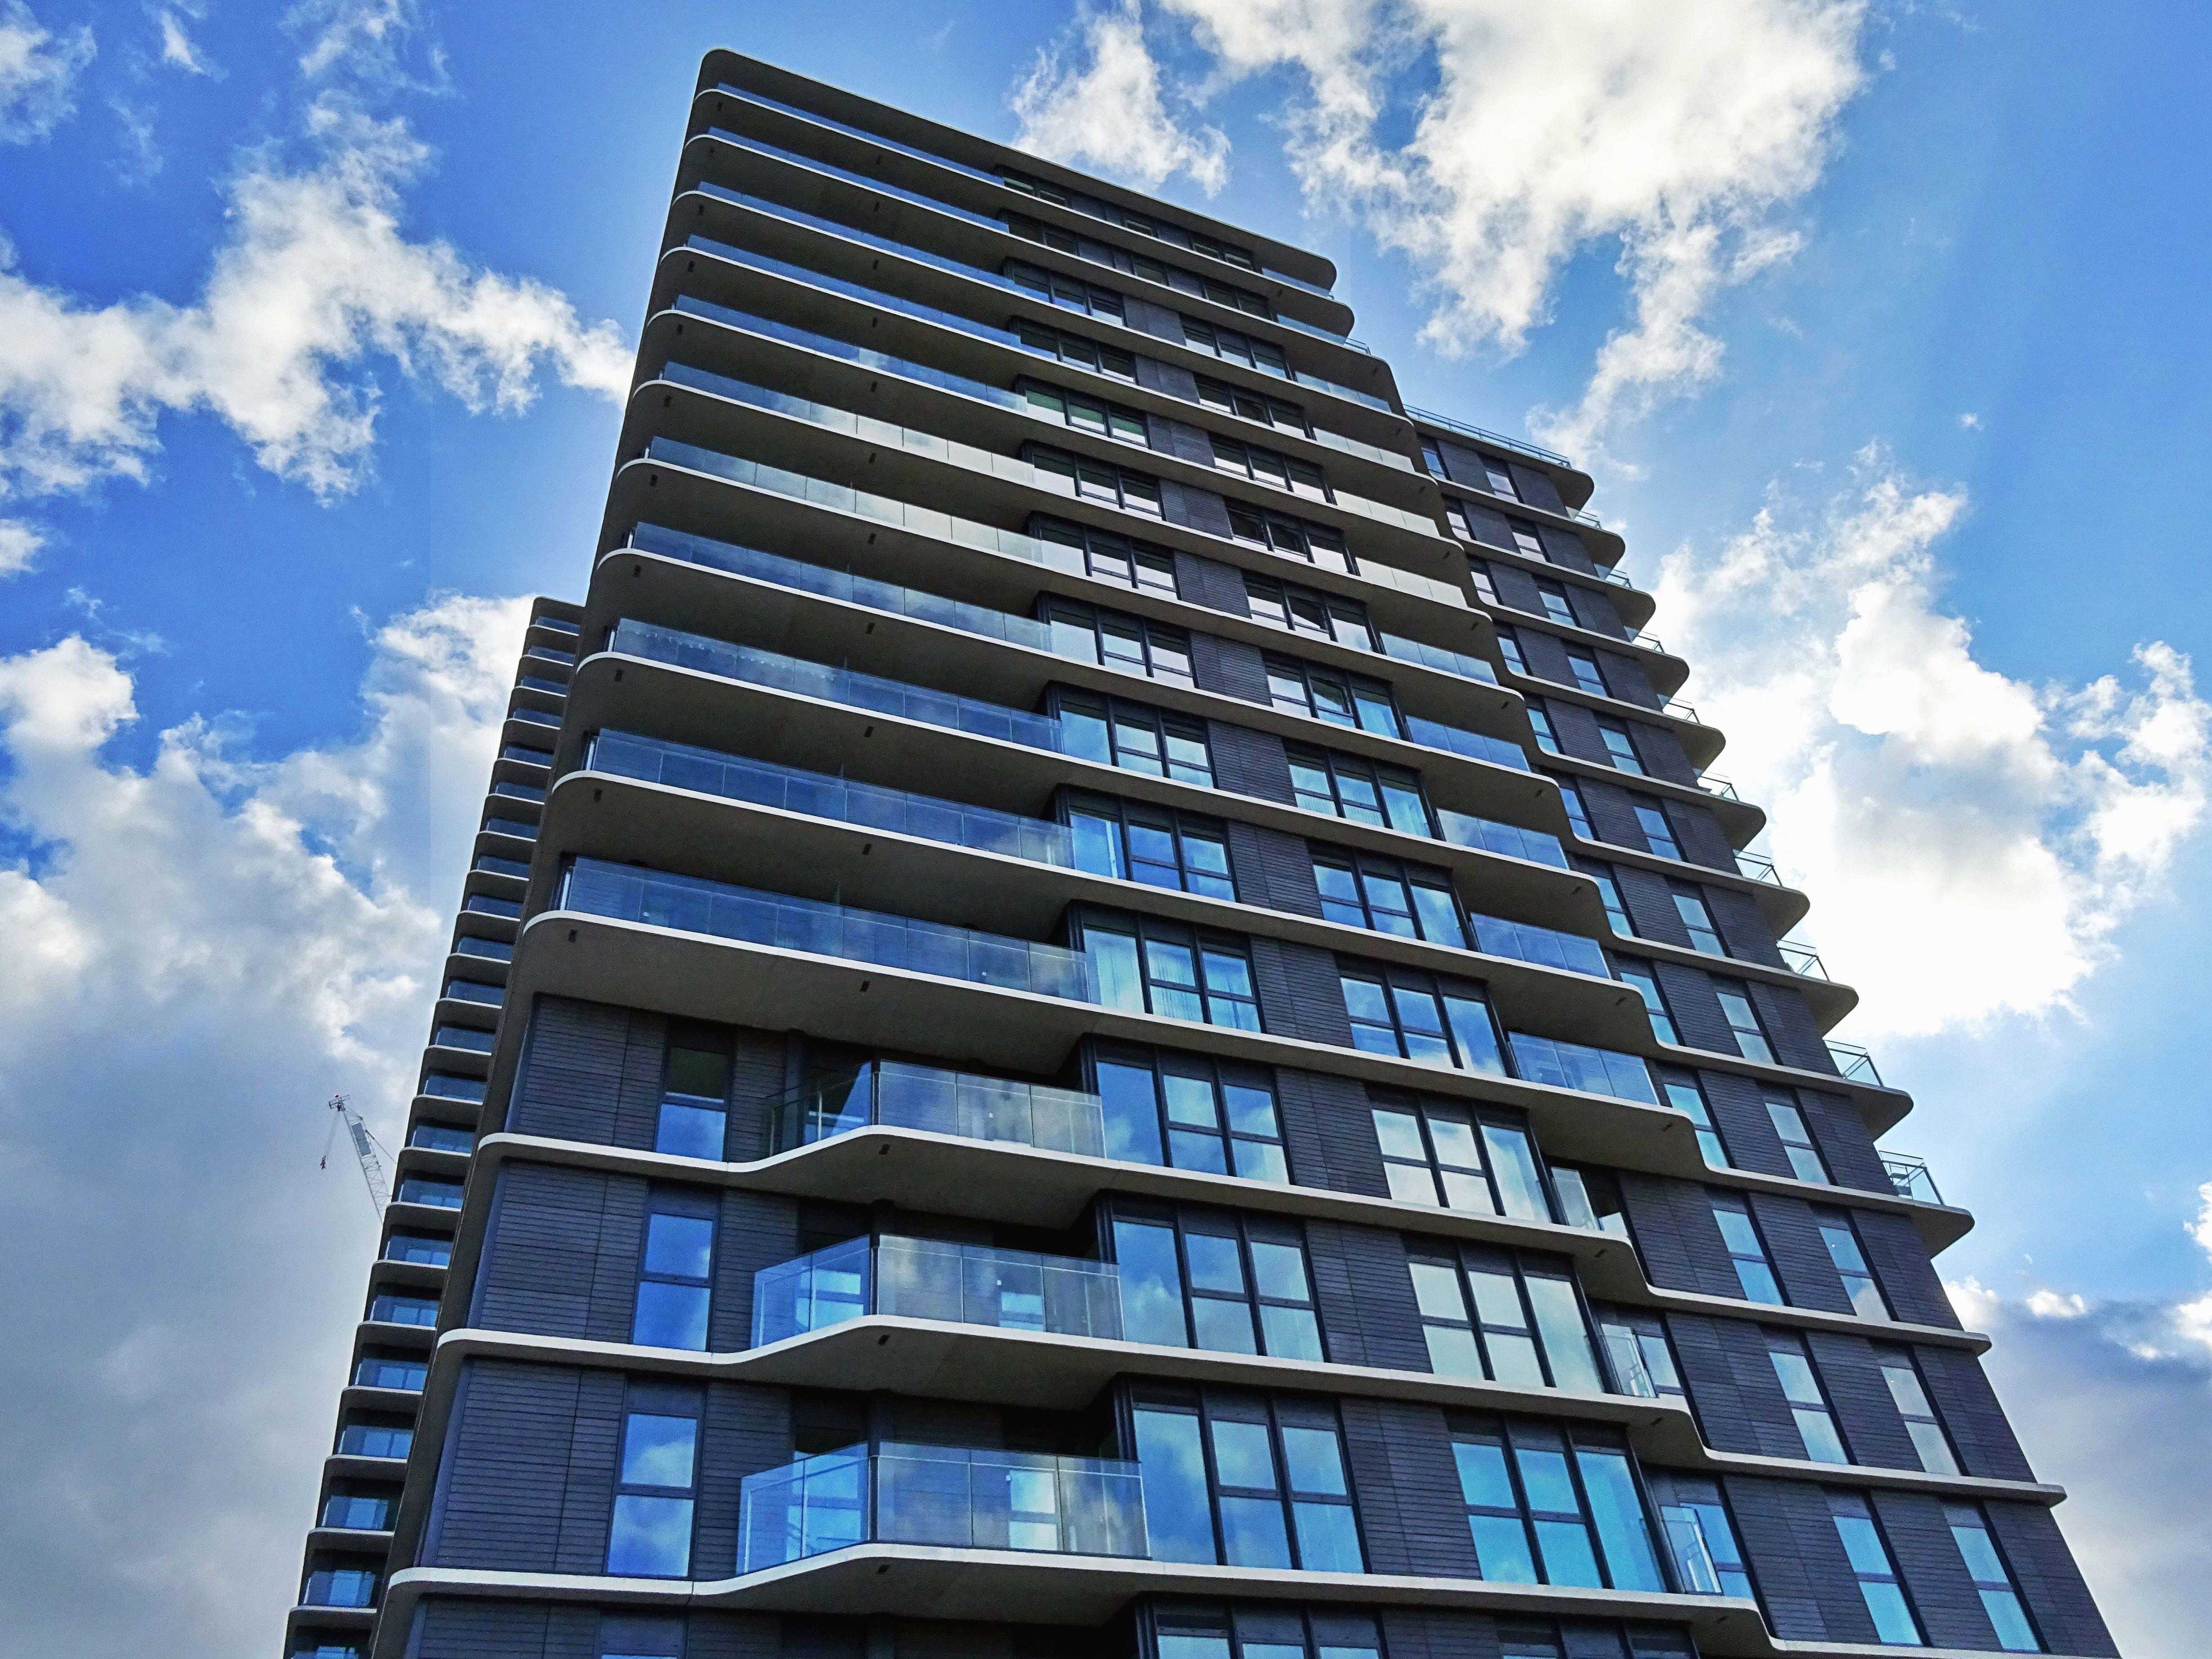 office facade. Sky, Cloud, Architecture, Building, Facade, Office, Window, Glass Office Facade S